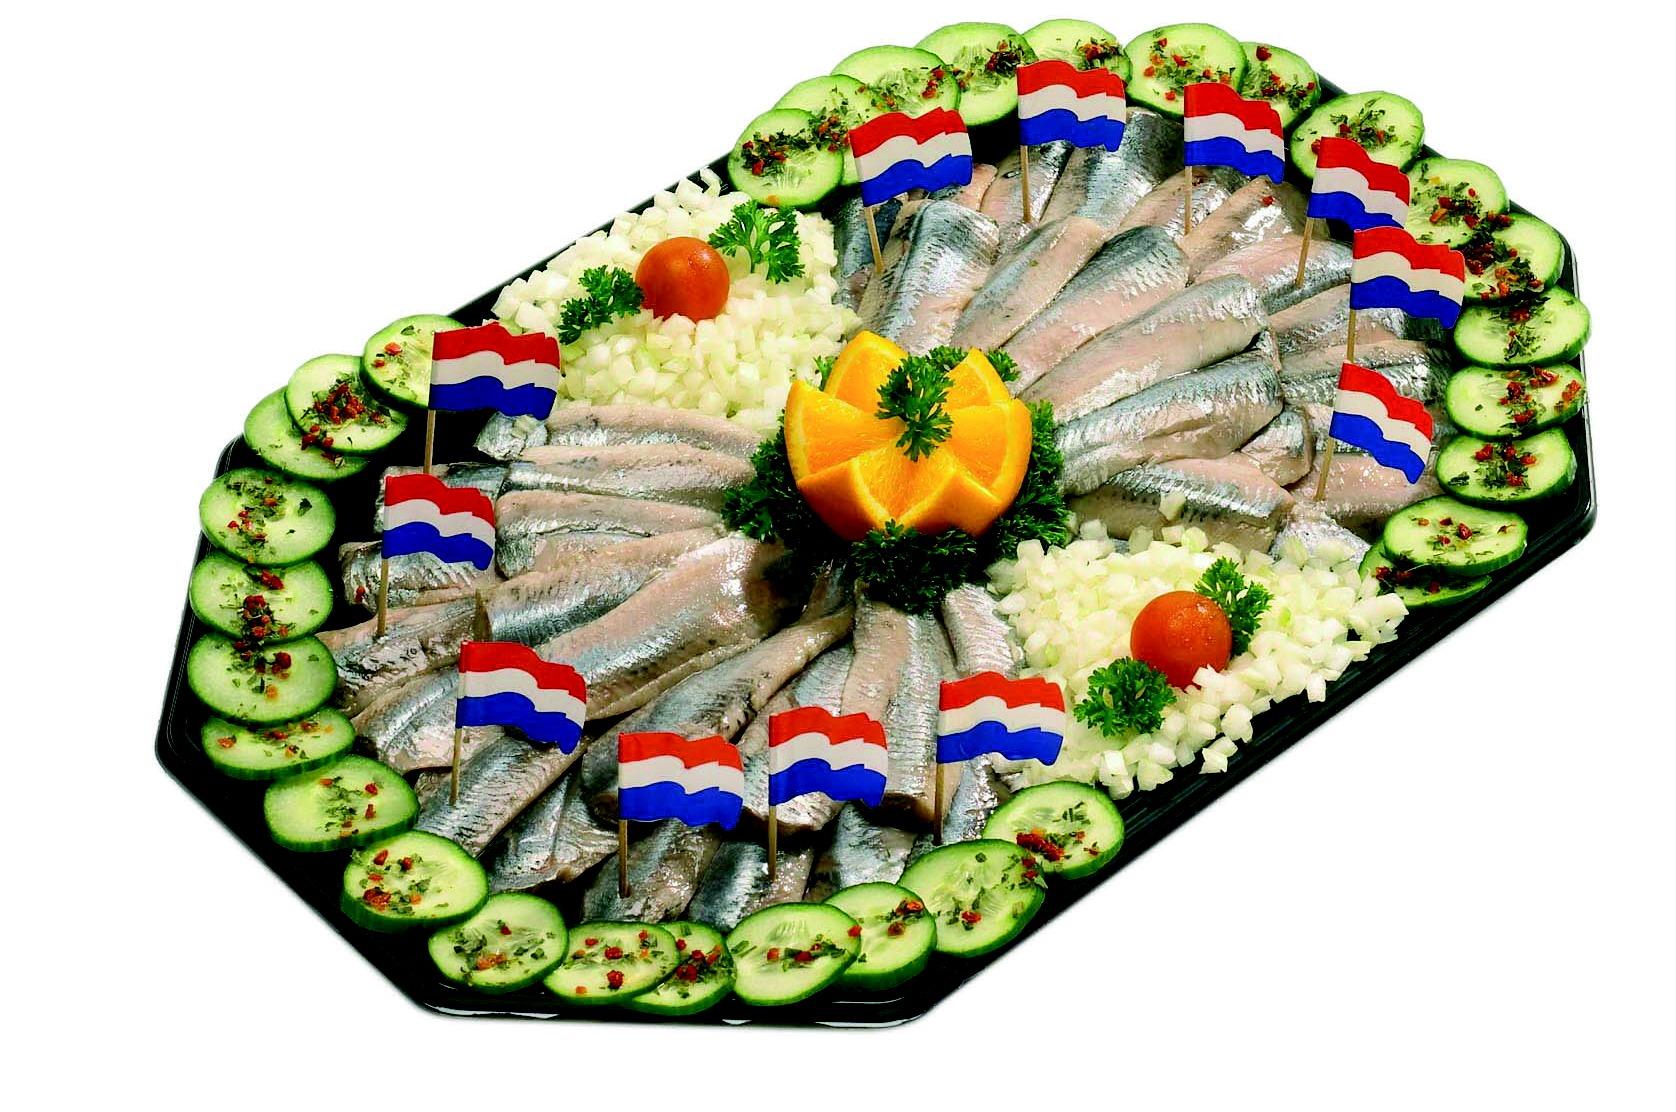 8. Hollandse Haringschaal